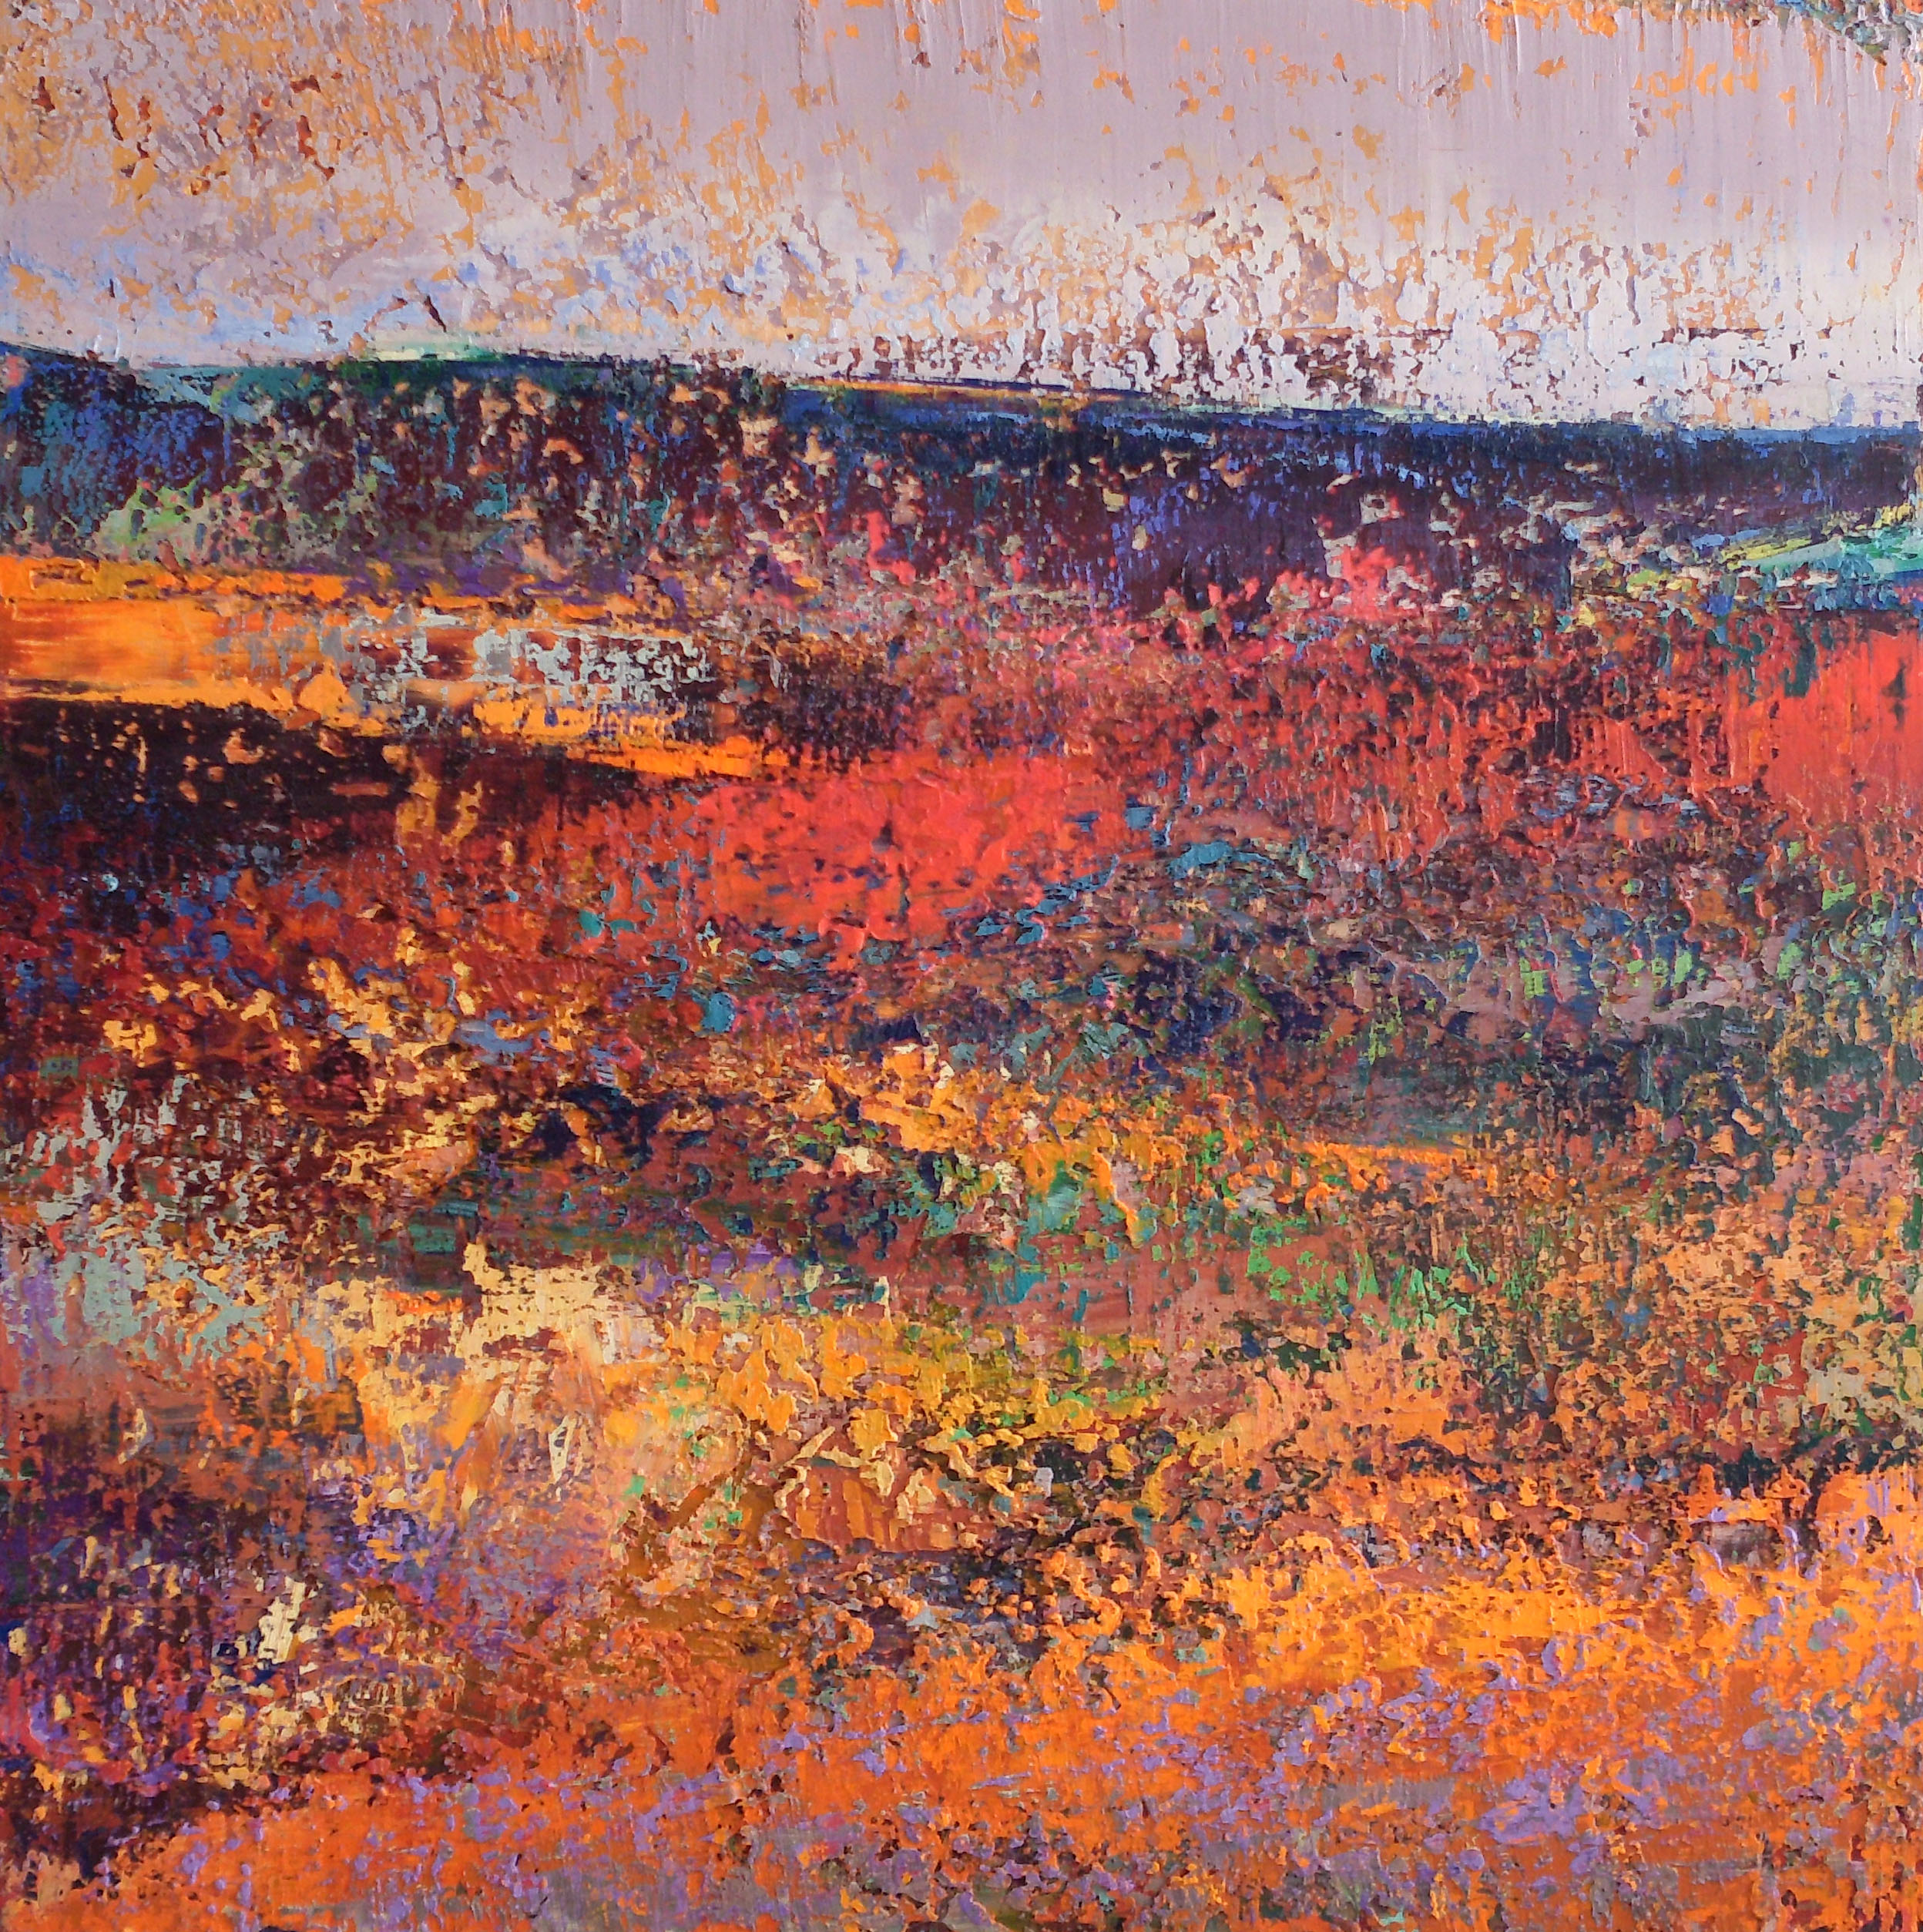 05-michael_freudenberg-abstrakte_landschaft_mit_dunklem_horizont-2005_2008-oel_auf_holz-110x110